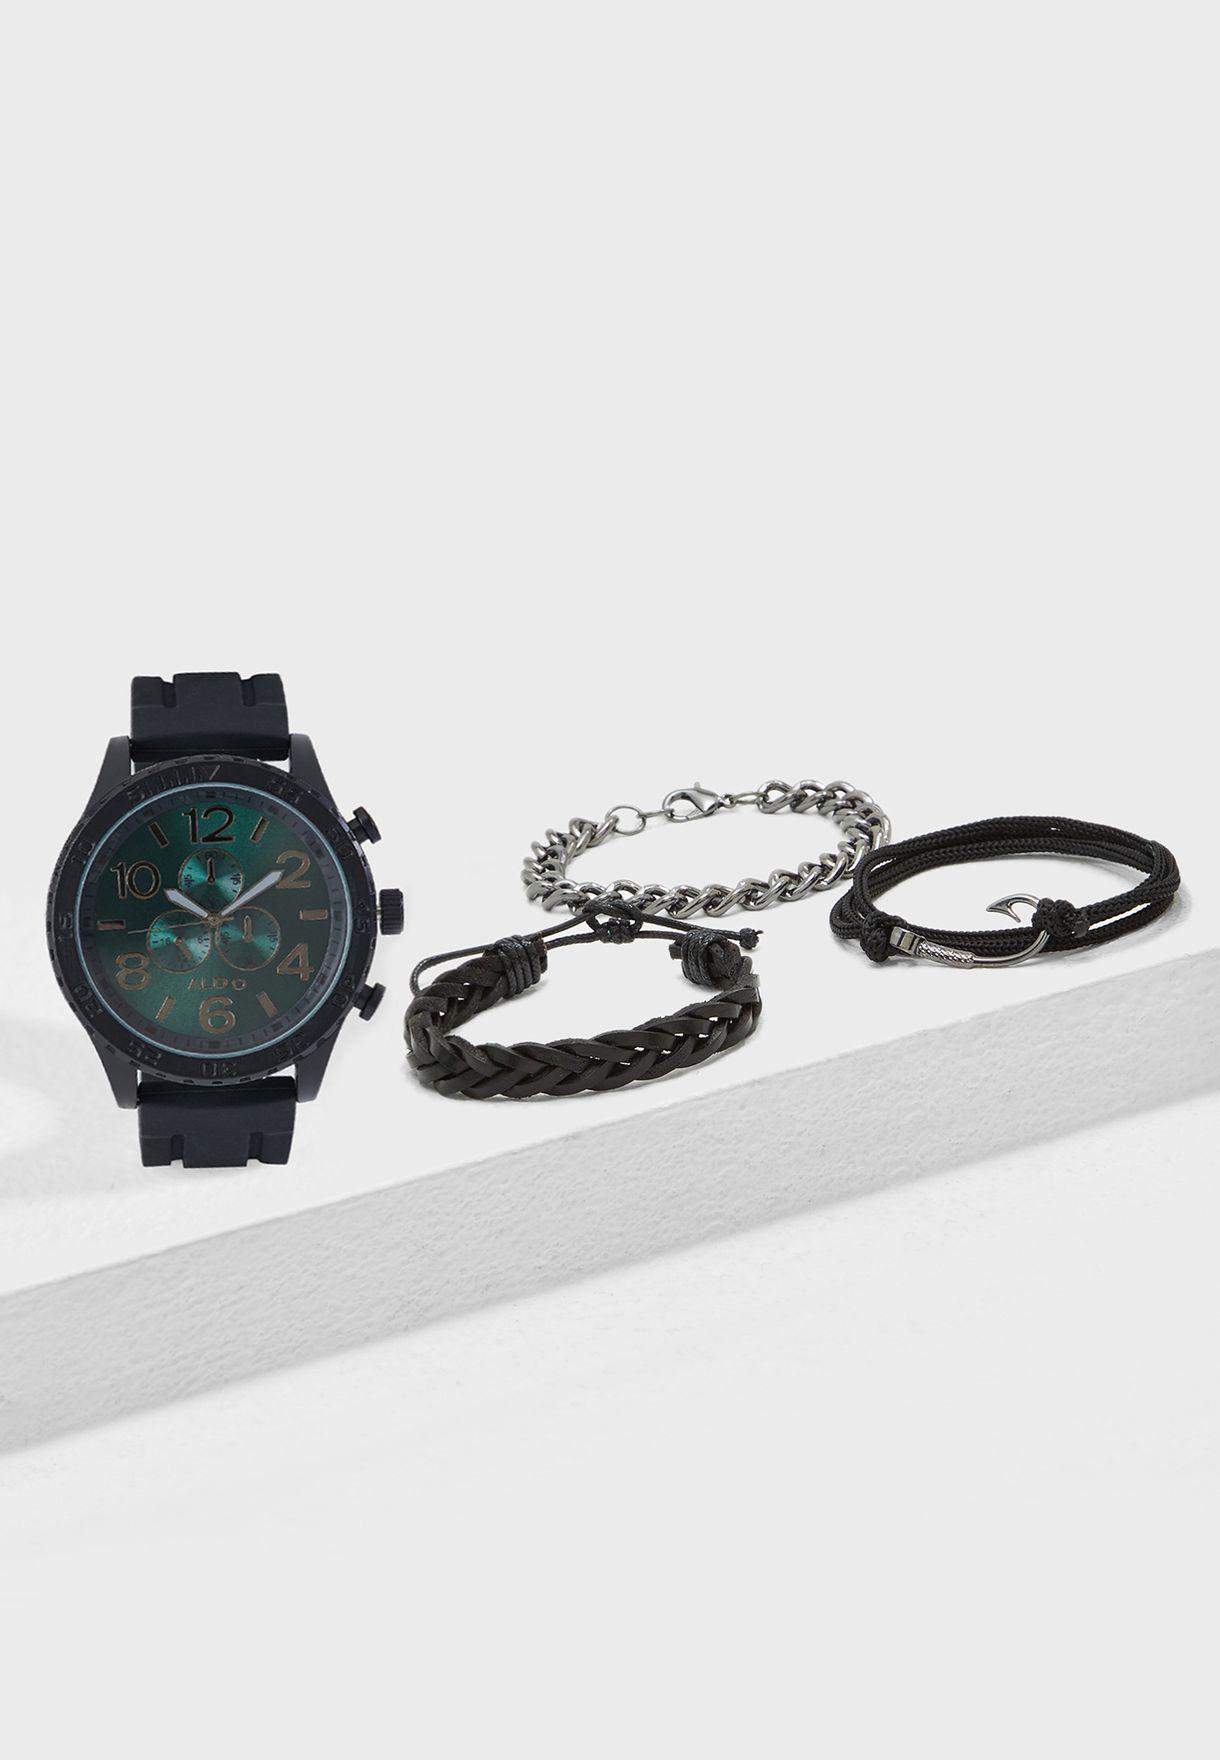 Ralema Watch